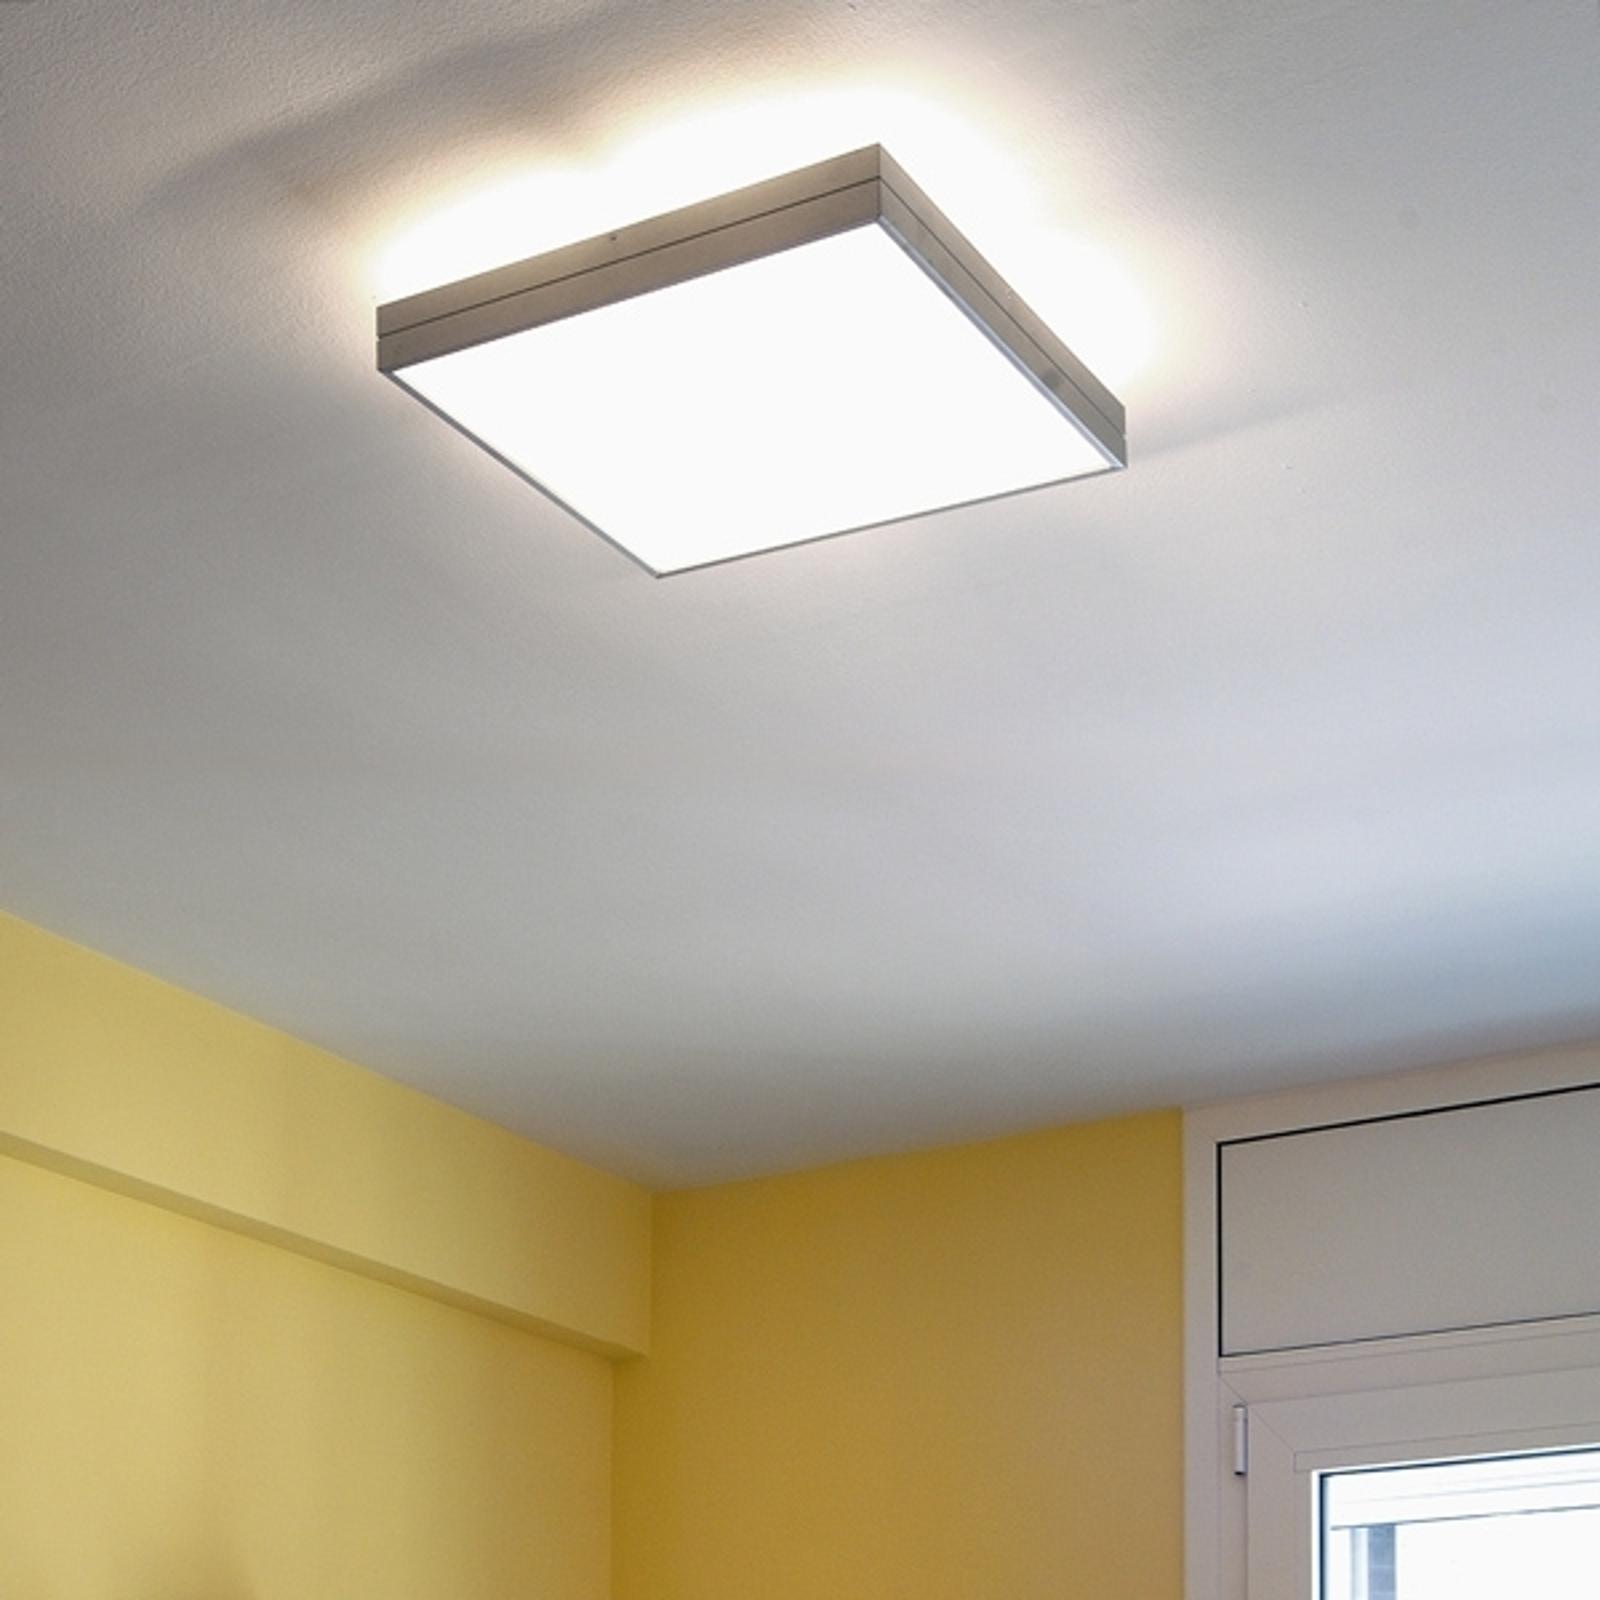 LINEA - purystyczna lampa sufitowa, 42 cm